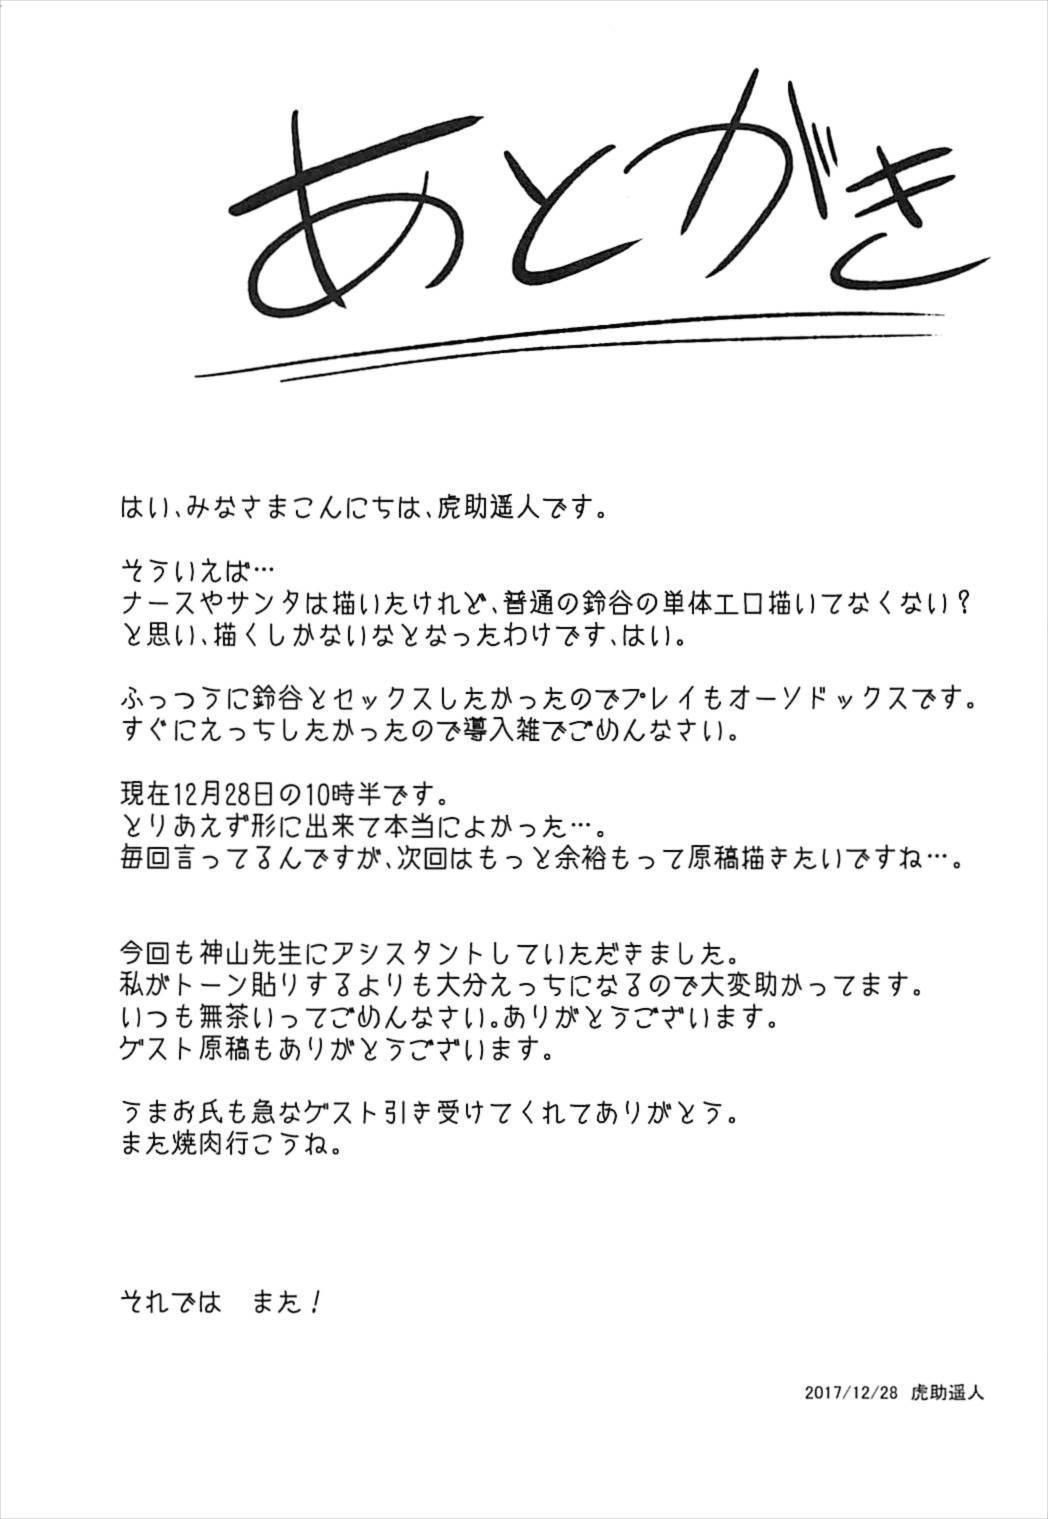 Suzuya to Ecchi Suru 19